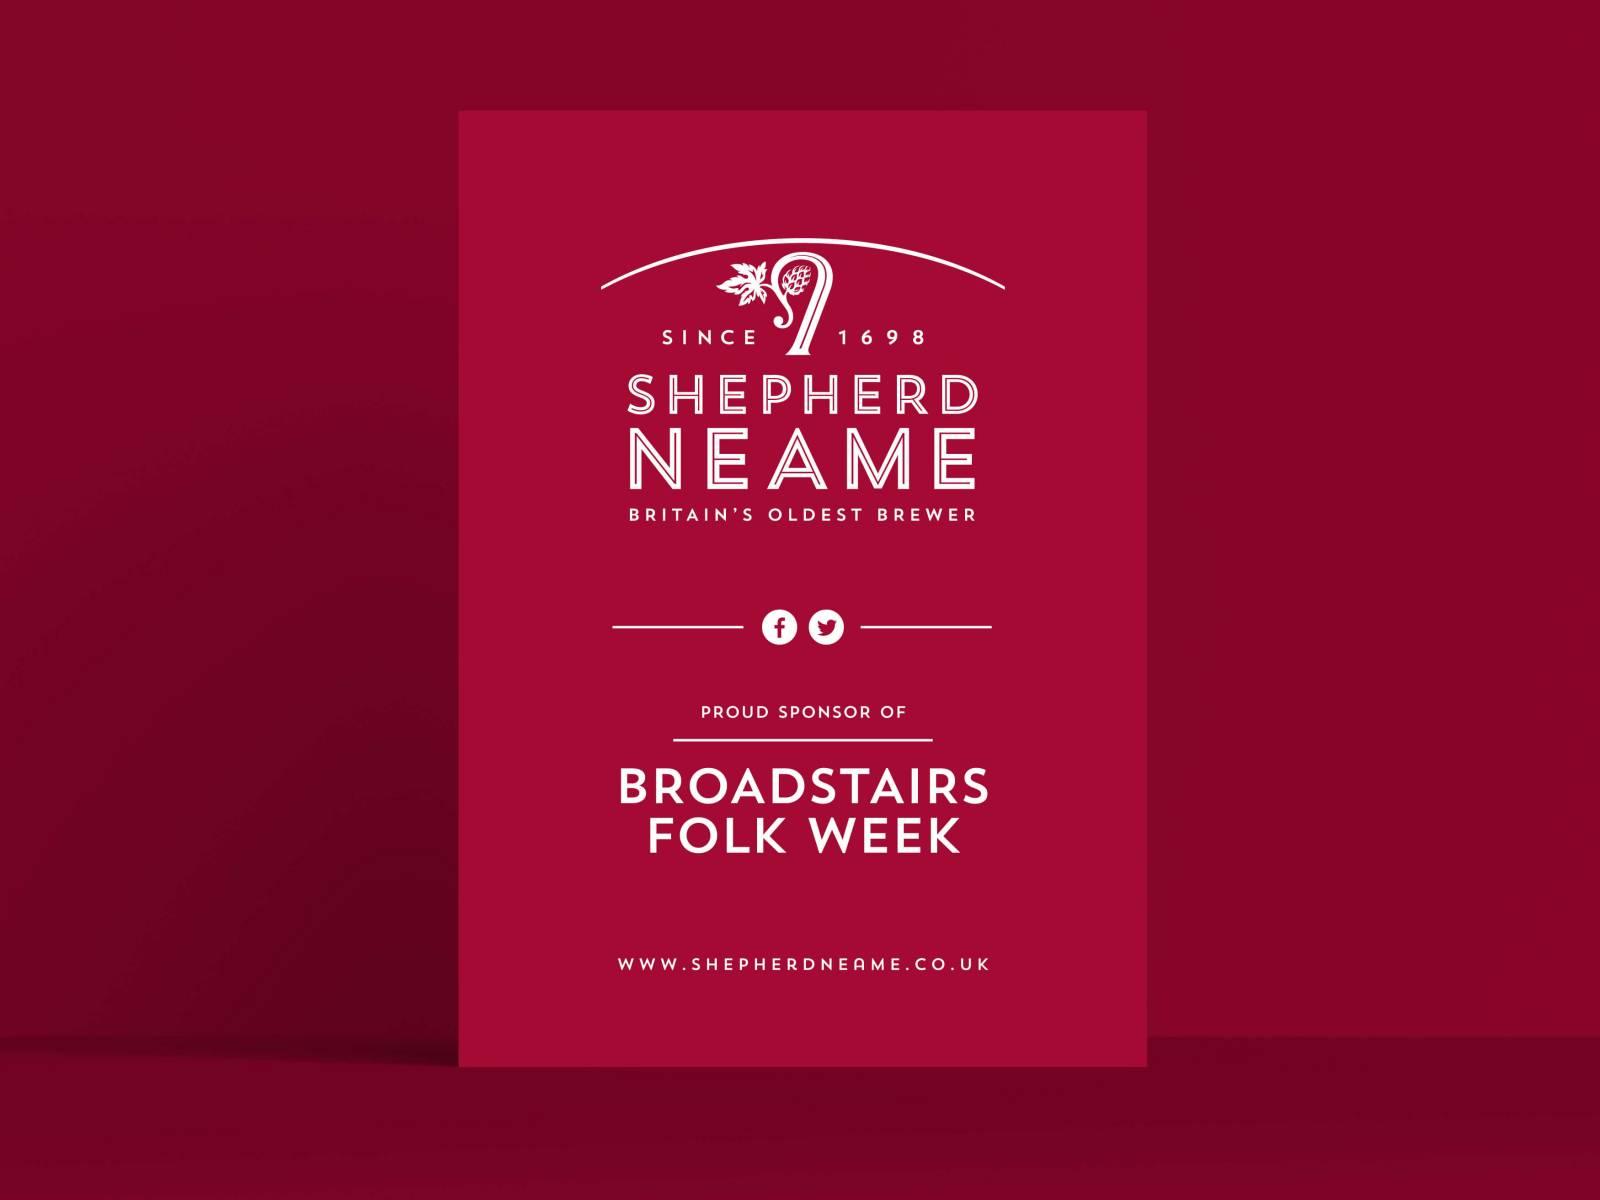 Advertising-Shepherd-Neame-Poster-2-Illustration-Canterbury-Graphic-Design.jpg